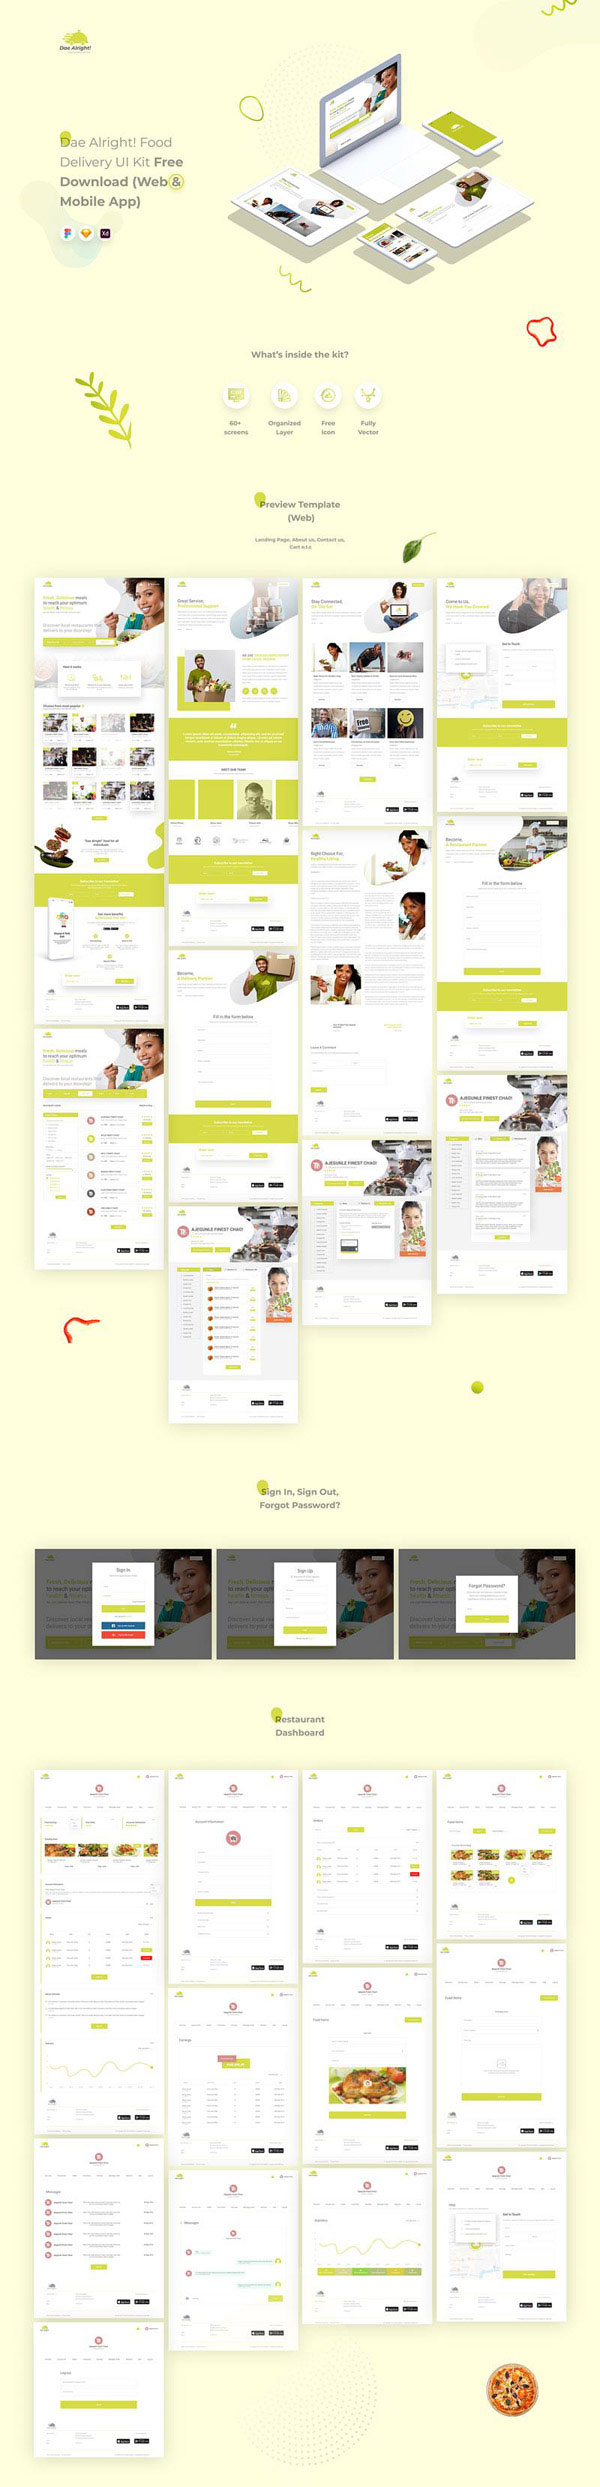 营养健康网页模板